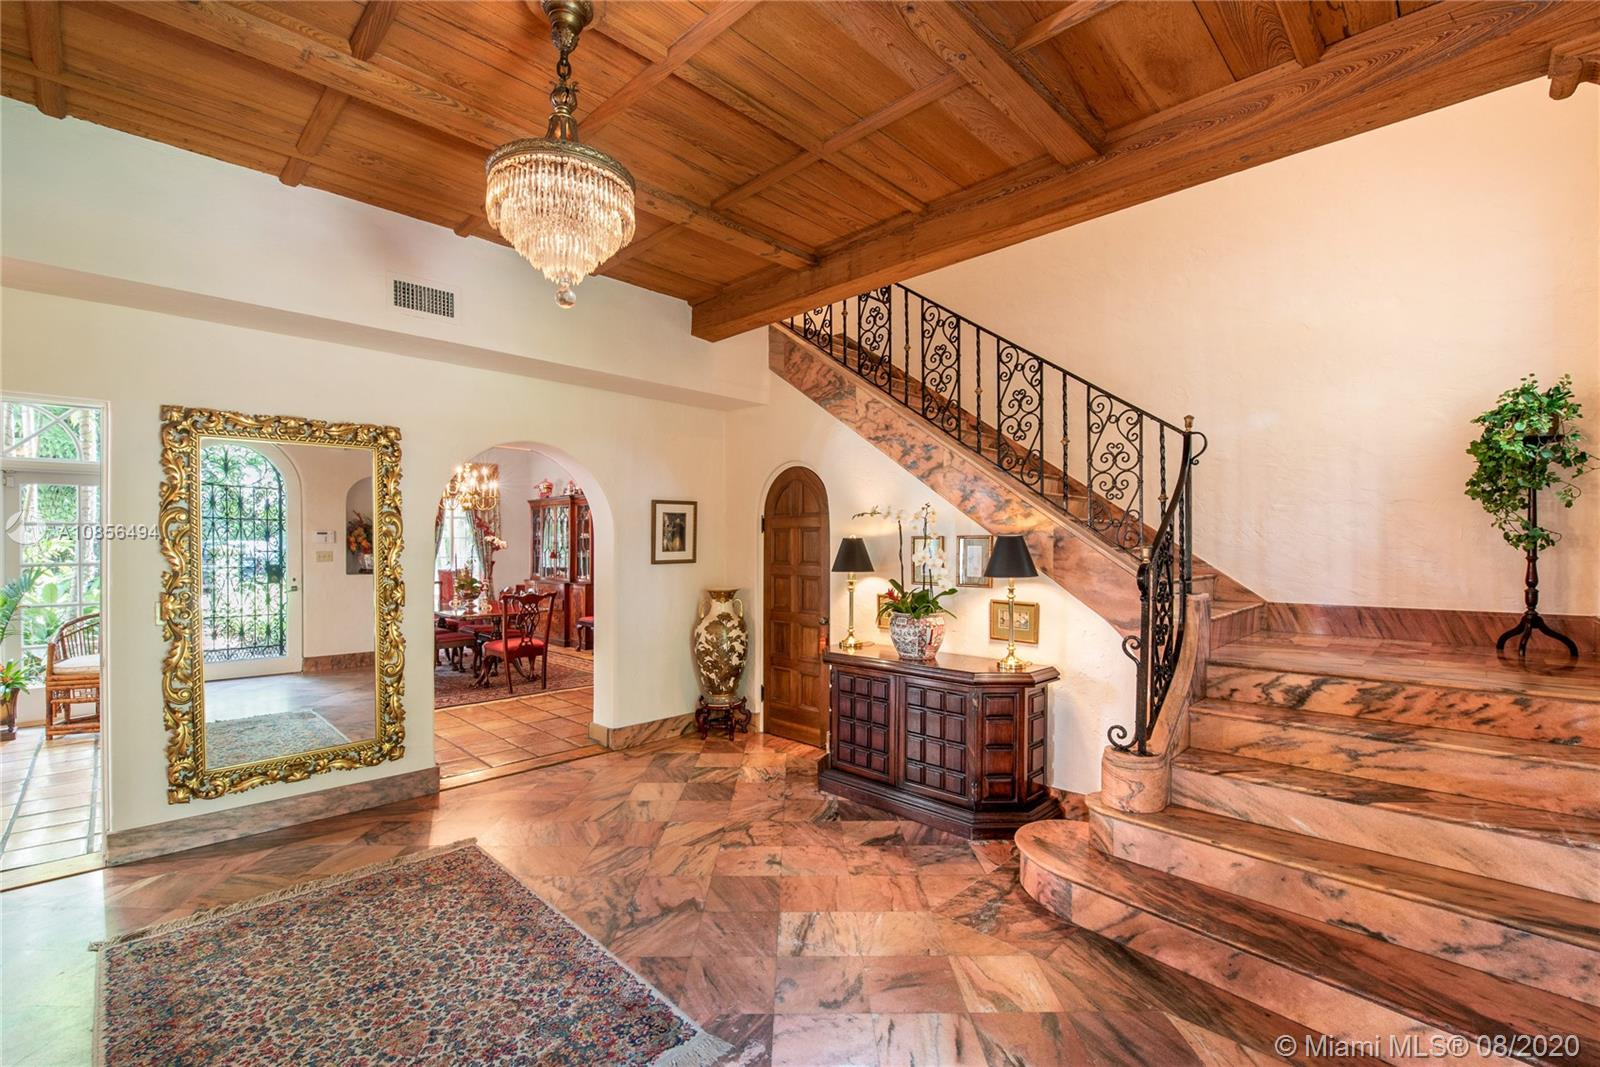 840 Coral Way, Coral Gables, Florida 33134, 5 Bedrooms Bedrooms, ,4 BathroomsBathrooms,Residential,For Sale,840 Coral Way,A10856494